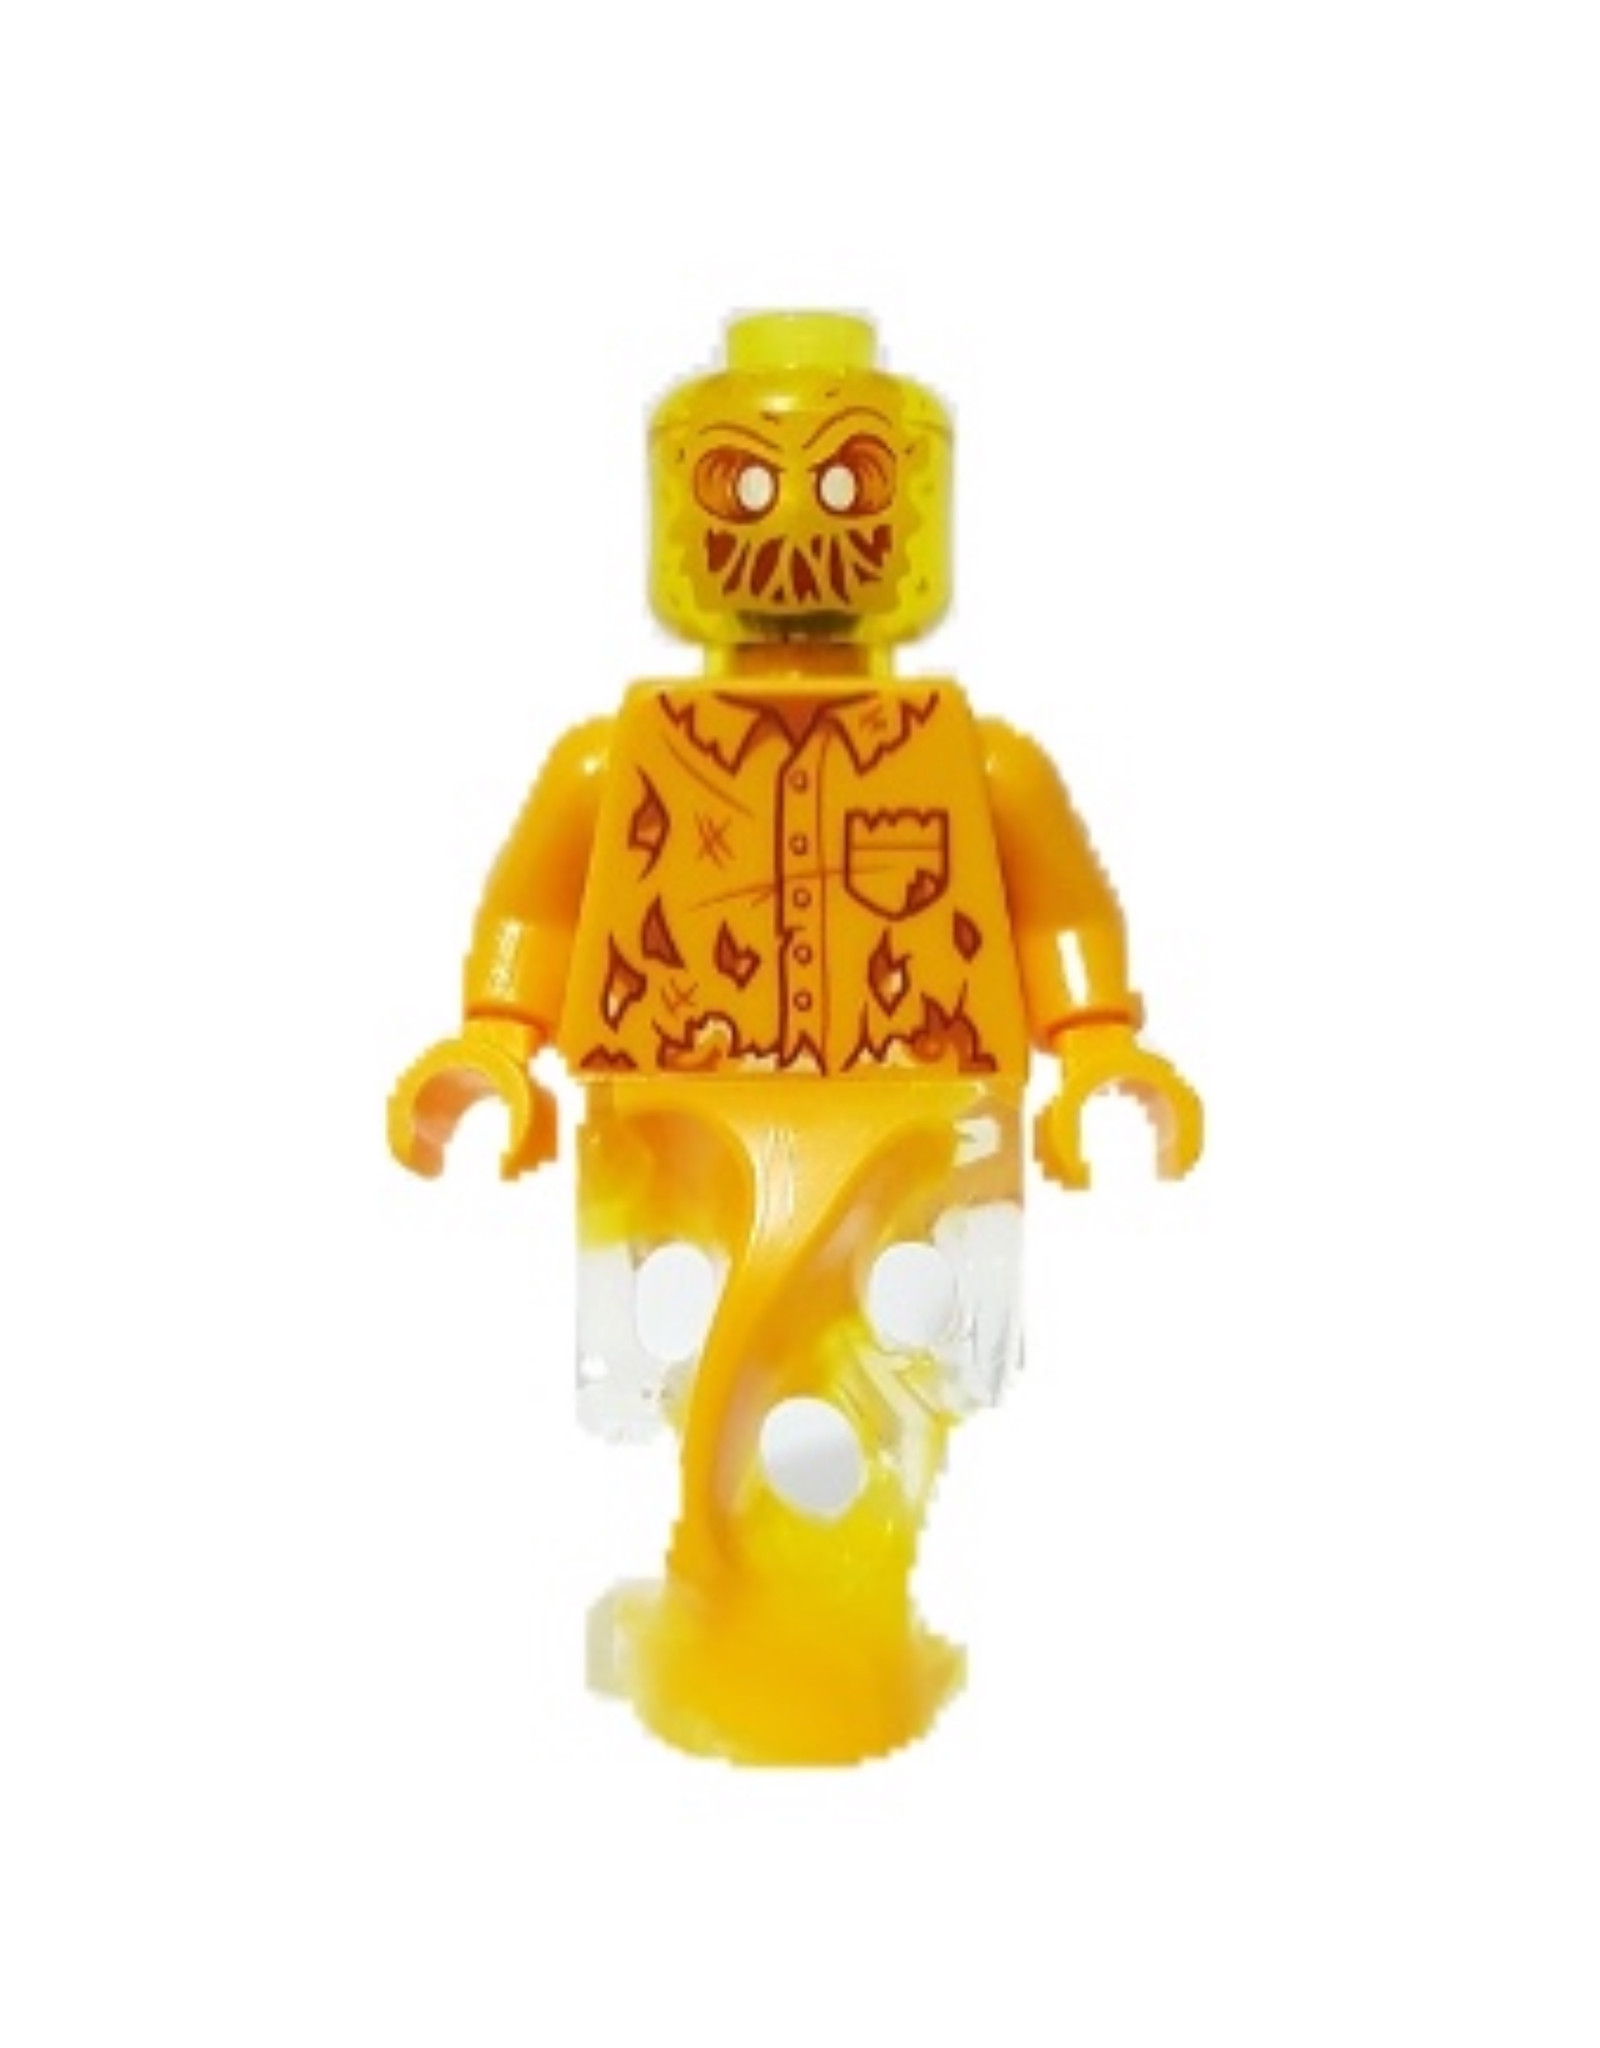 LEGO LEGO Hidden Side Scrimper minifiguur HS033